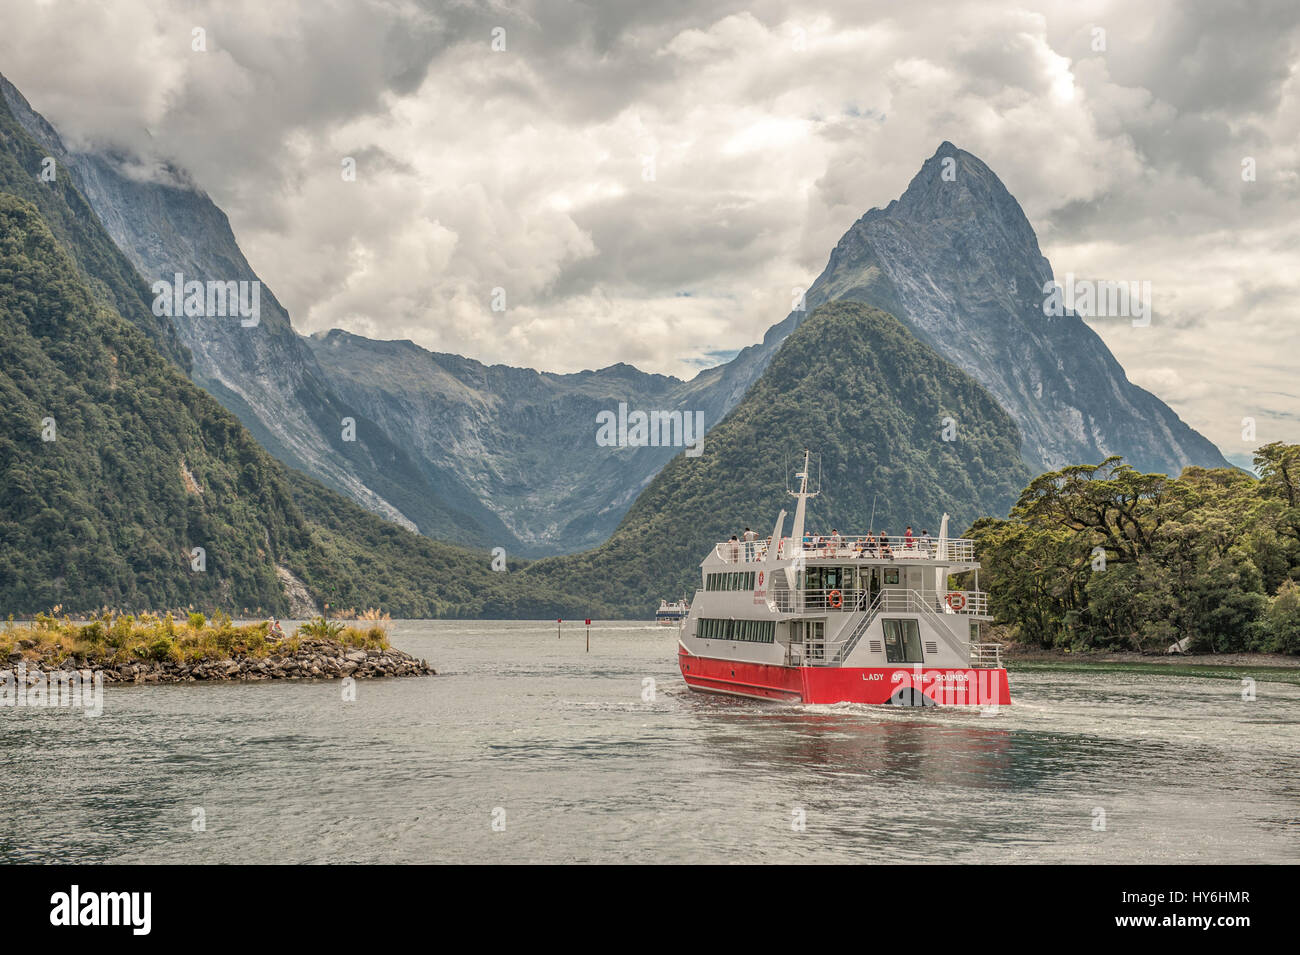 Tourenboot Kreuzfahrt im Milford Sound, Mammutt National Park, Neuseeland Stockbild